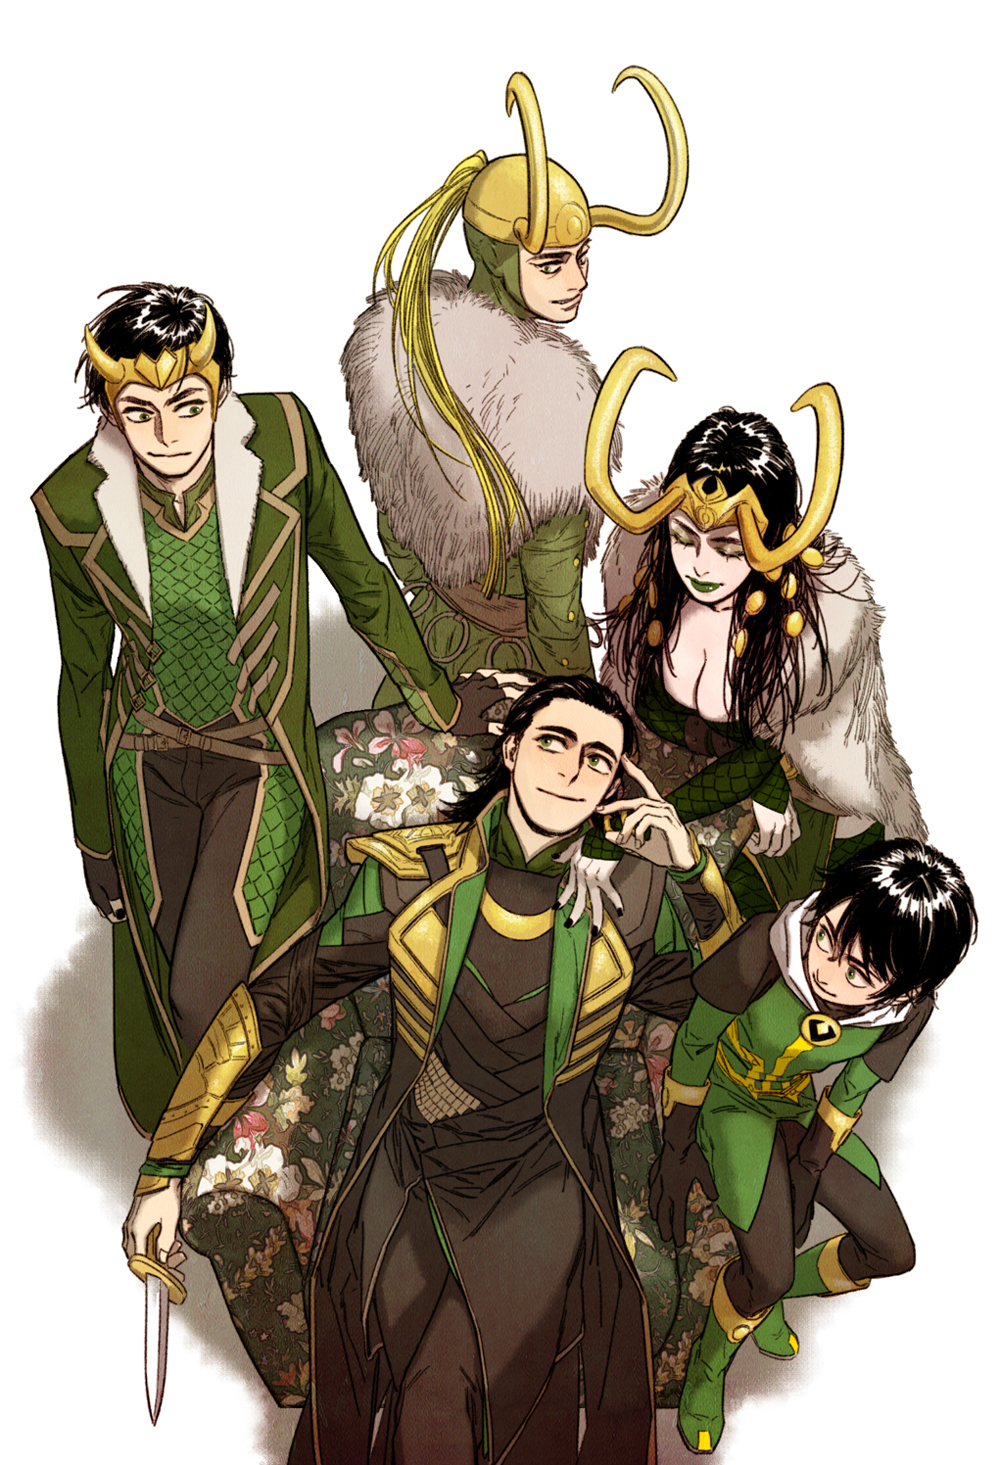 Good Wallpaper Marvel Loki - Loki  Picture_504279.jpg